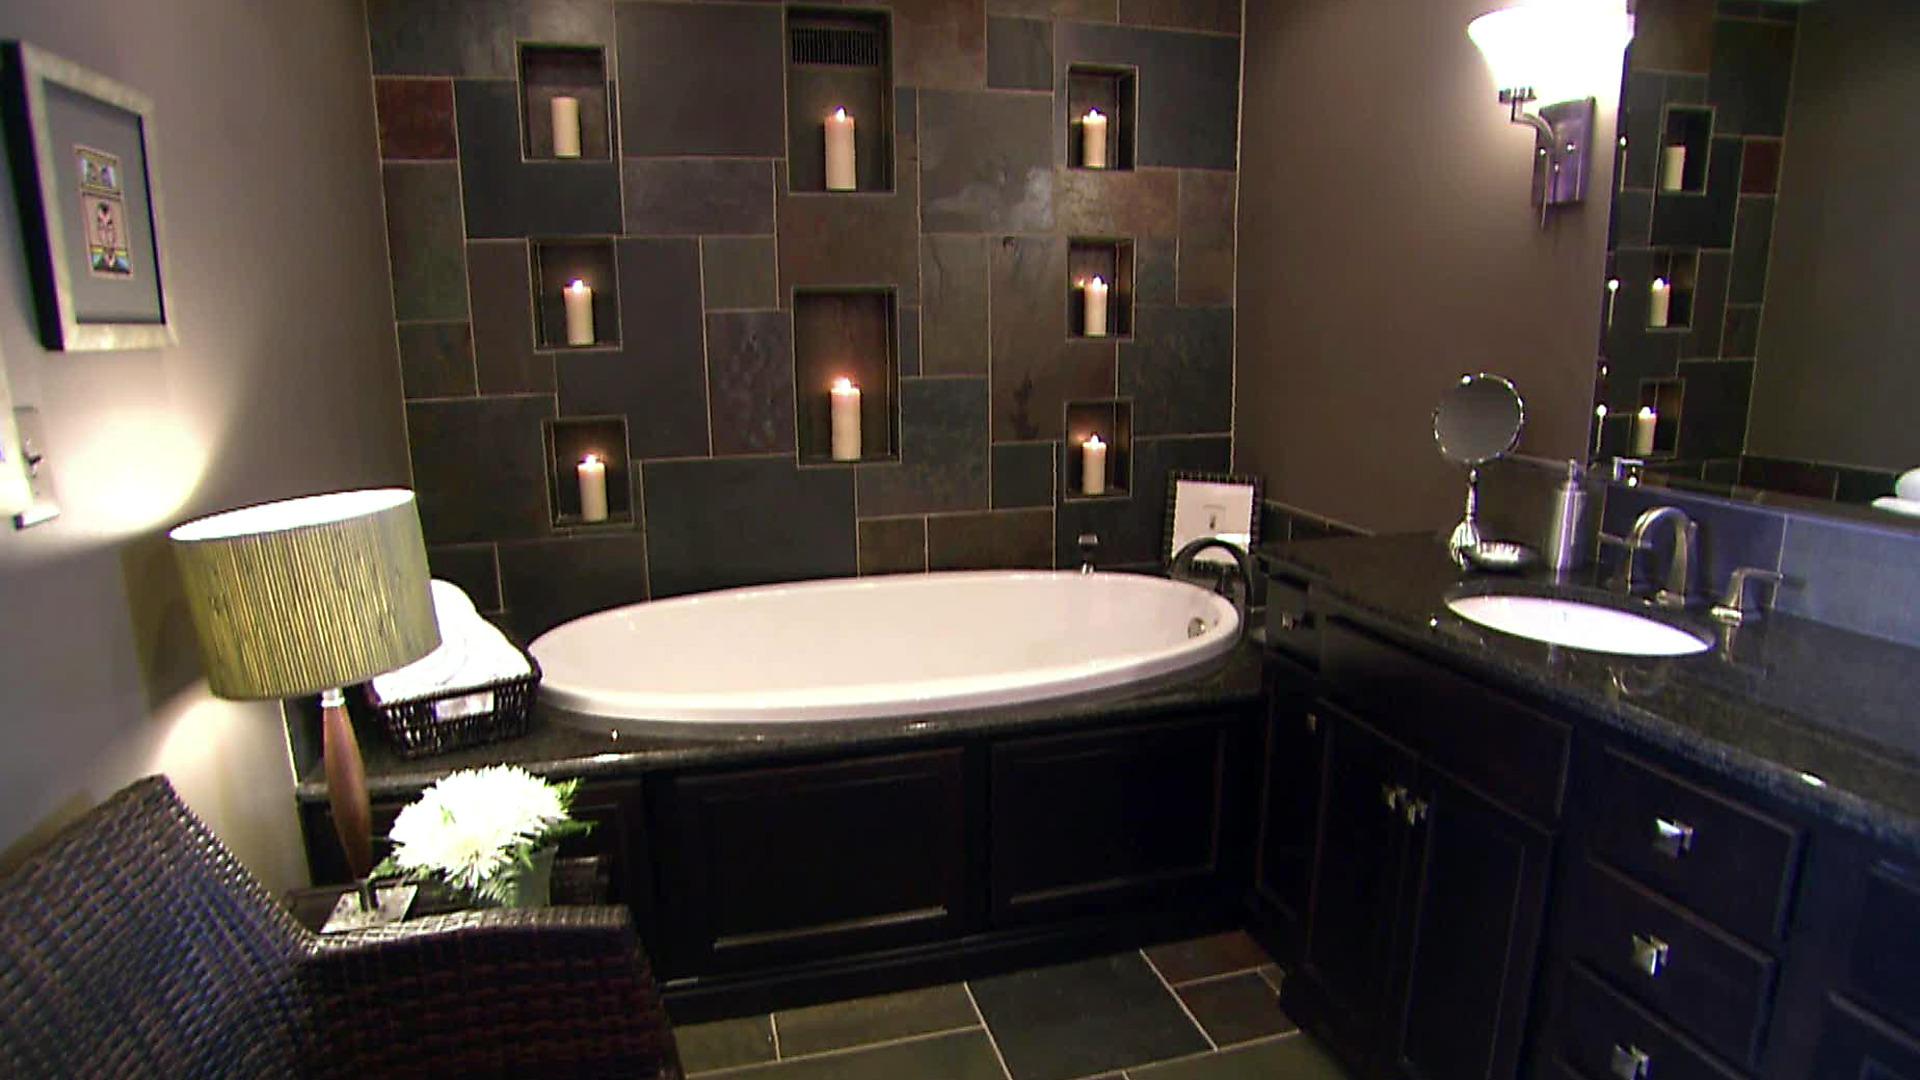 Small Bathroom Makeover Bathroom Makeover Ideas, Pictures & Videos    HGTV FVBTCRG